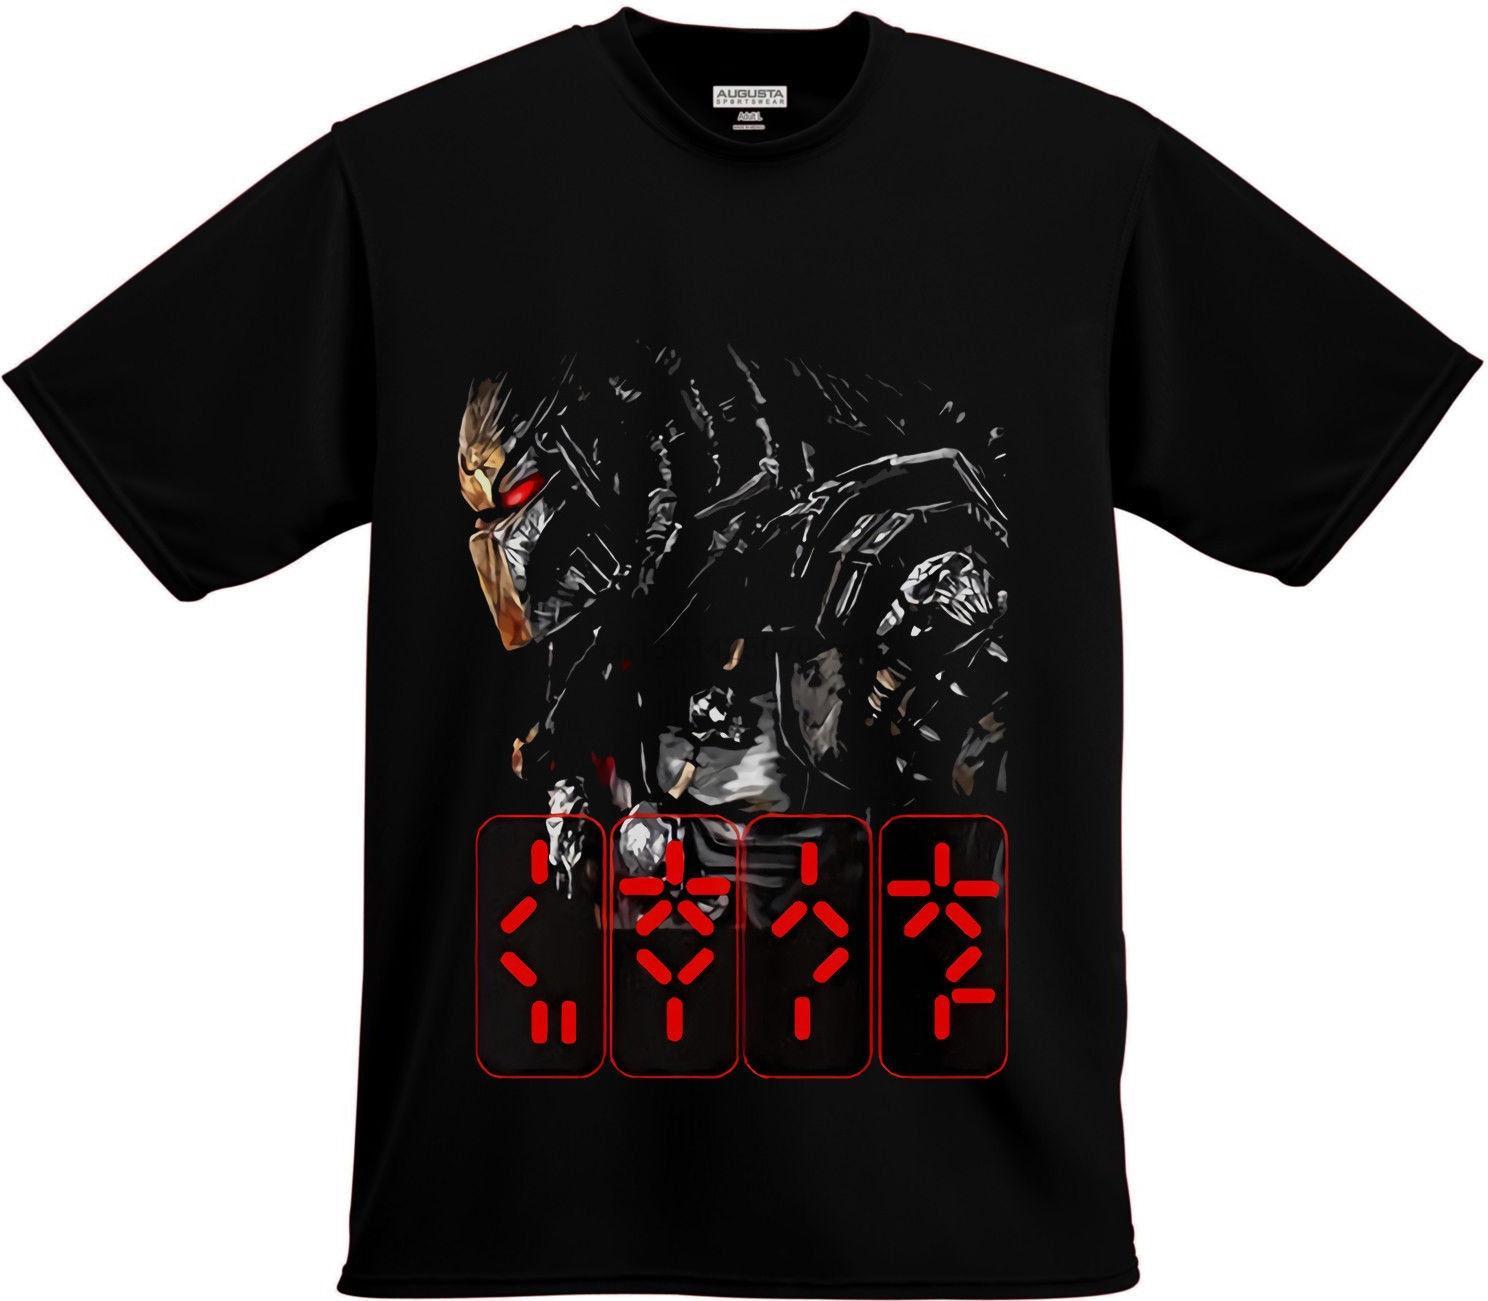 Yeni Predator Korku Gerilim Filmi Siyah Tişört T-Shirt Tee Boyut S-3XL Tişört Fashiont Gömlek Ücretsiz Kargo Üst Tee